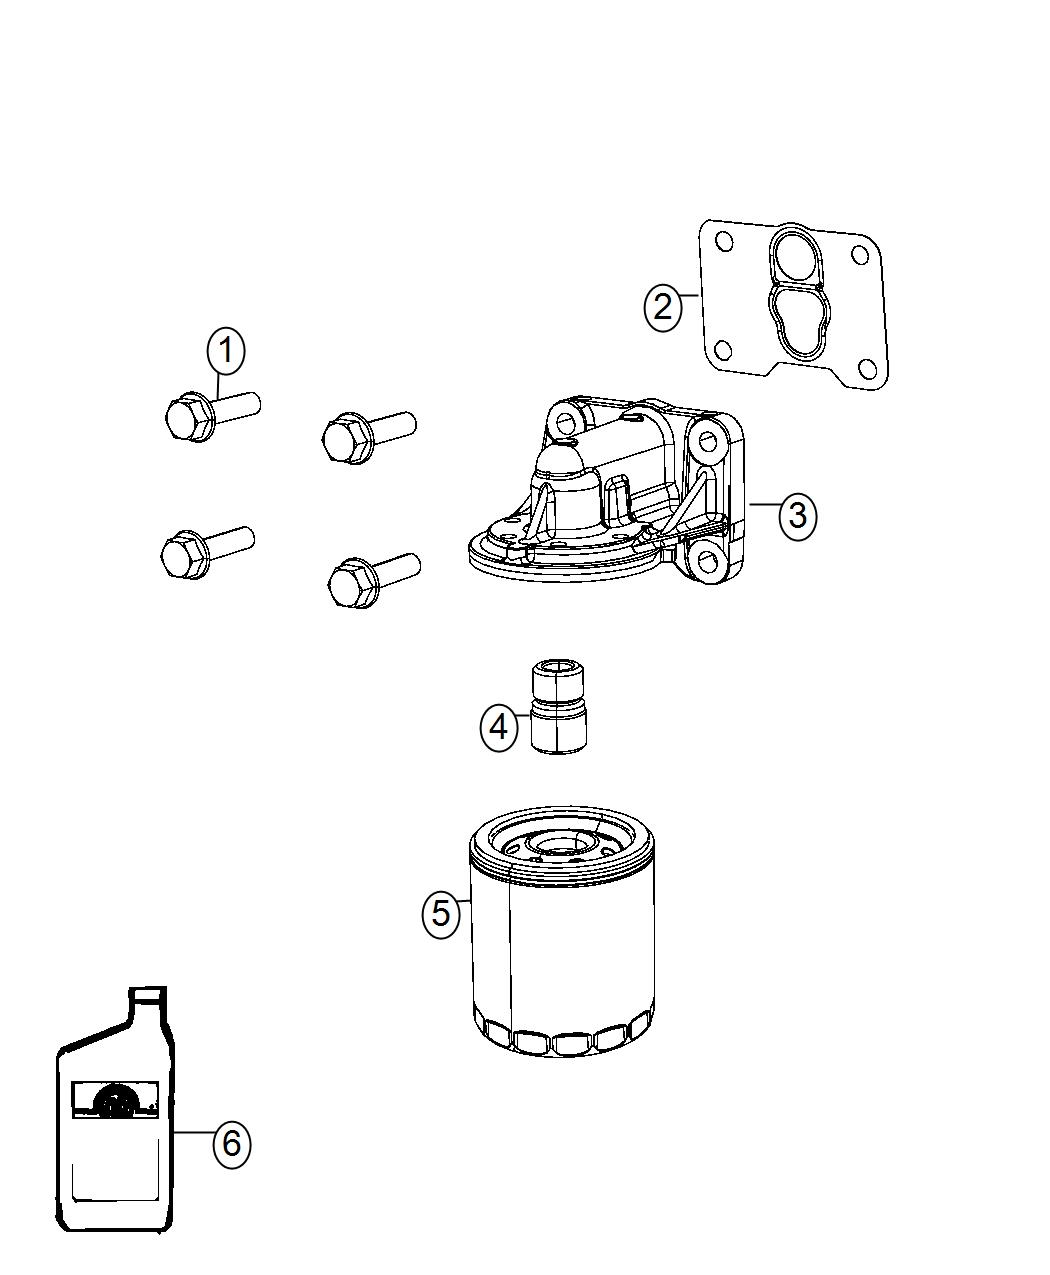 2016 Dodge Dart Adapter  Oil Filter